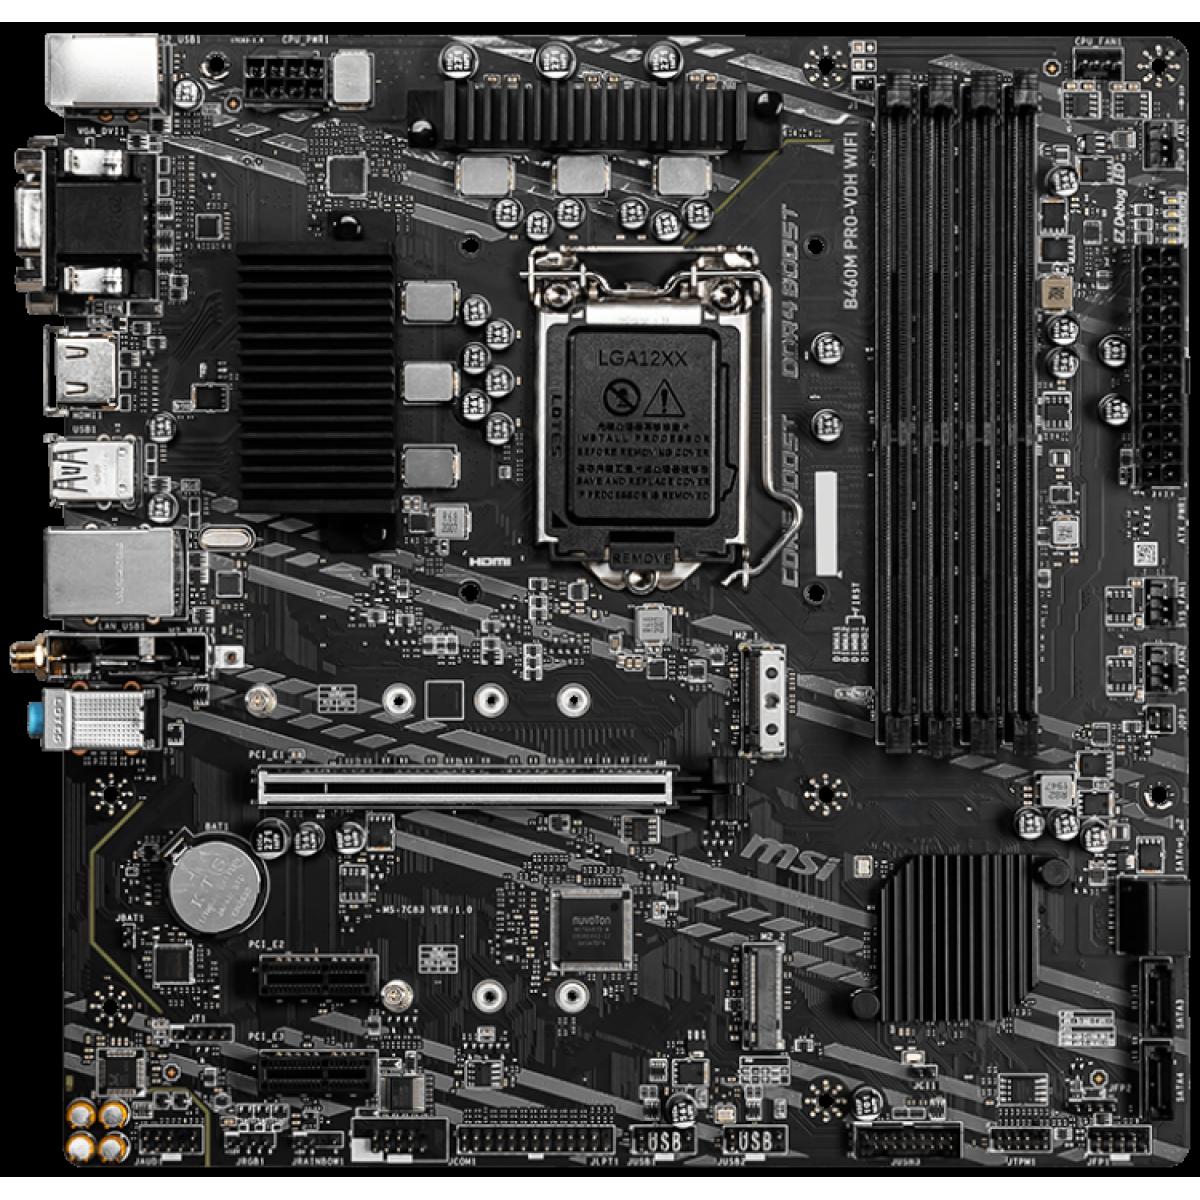 Placa Mãe MSI B460M PRO-VDH WIFI, Chipset B460M, INTEL LGA 1200, mATX, DDR4, 911-7C83-011